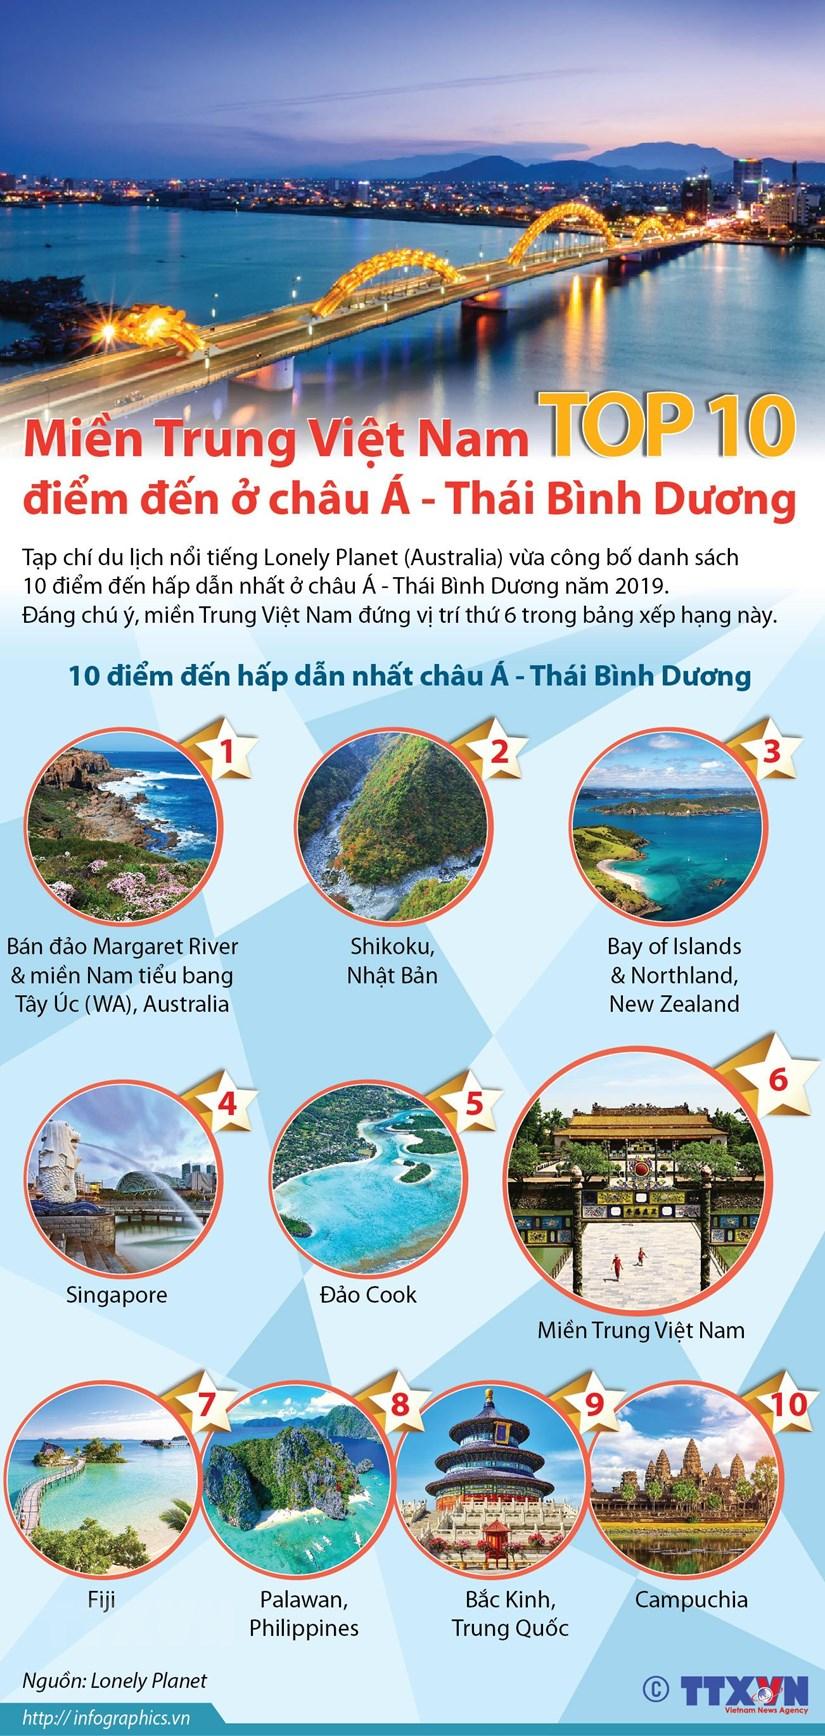 [Infographics] Mien Trung Viet Nam lot top 10 diem den o chau A-TBD hinh anh 1